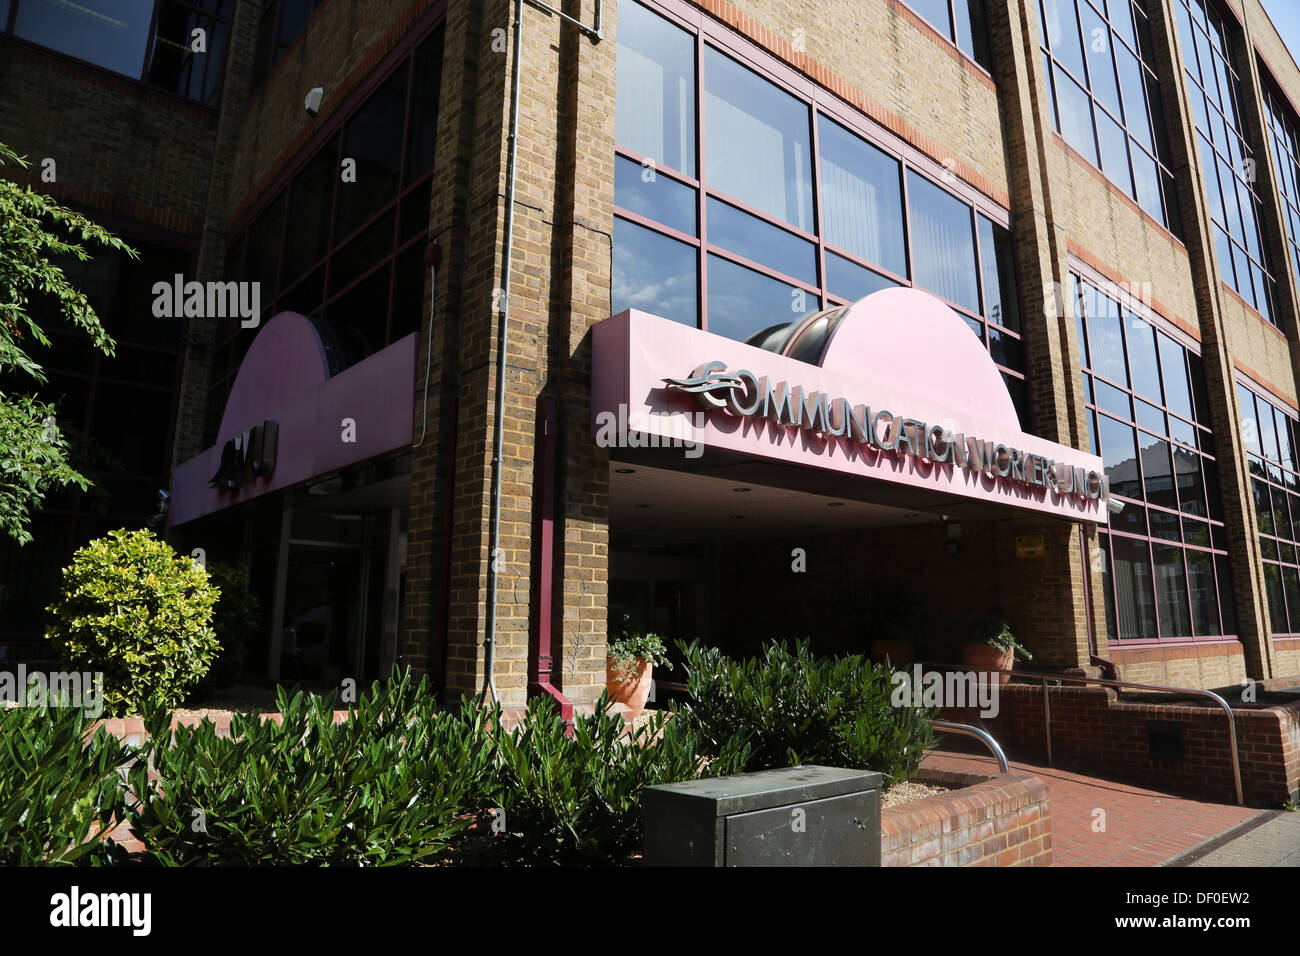 Wimbledon London England The Broadway Communication Workers Union Headquarters Entrance - Stock Image